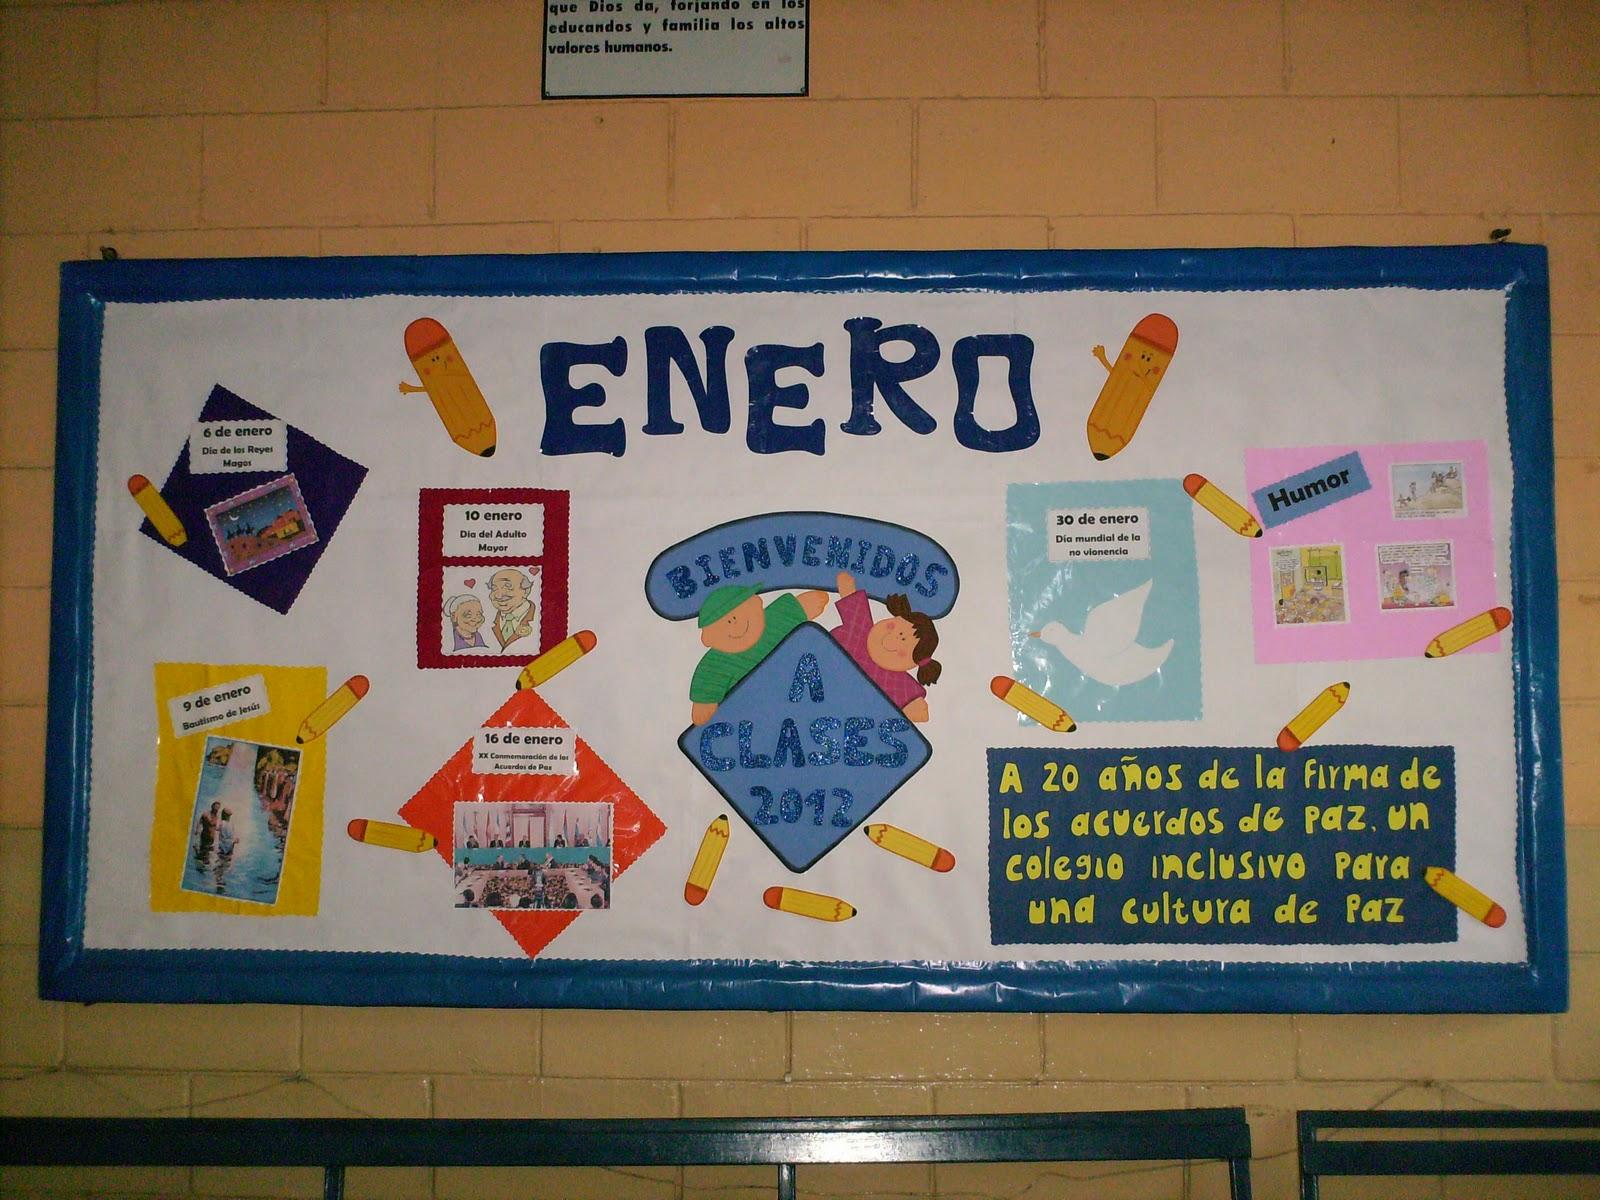 Periodico mura enero 2 imagenes educativas for Concepto de periodico mural